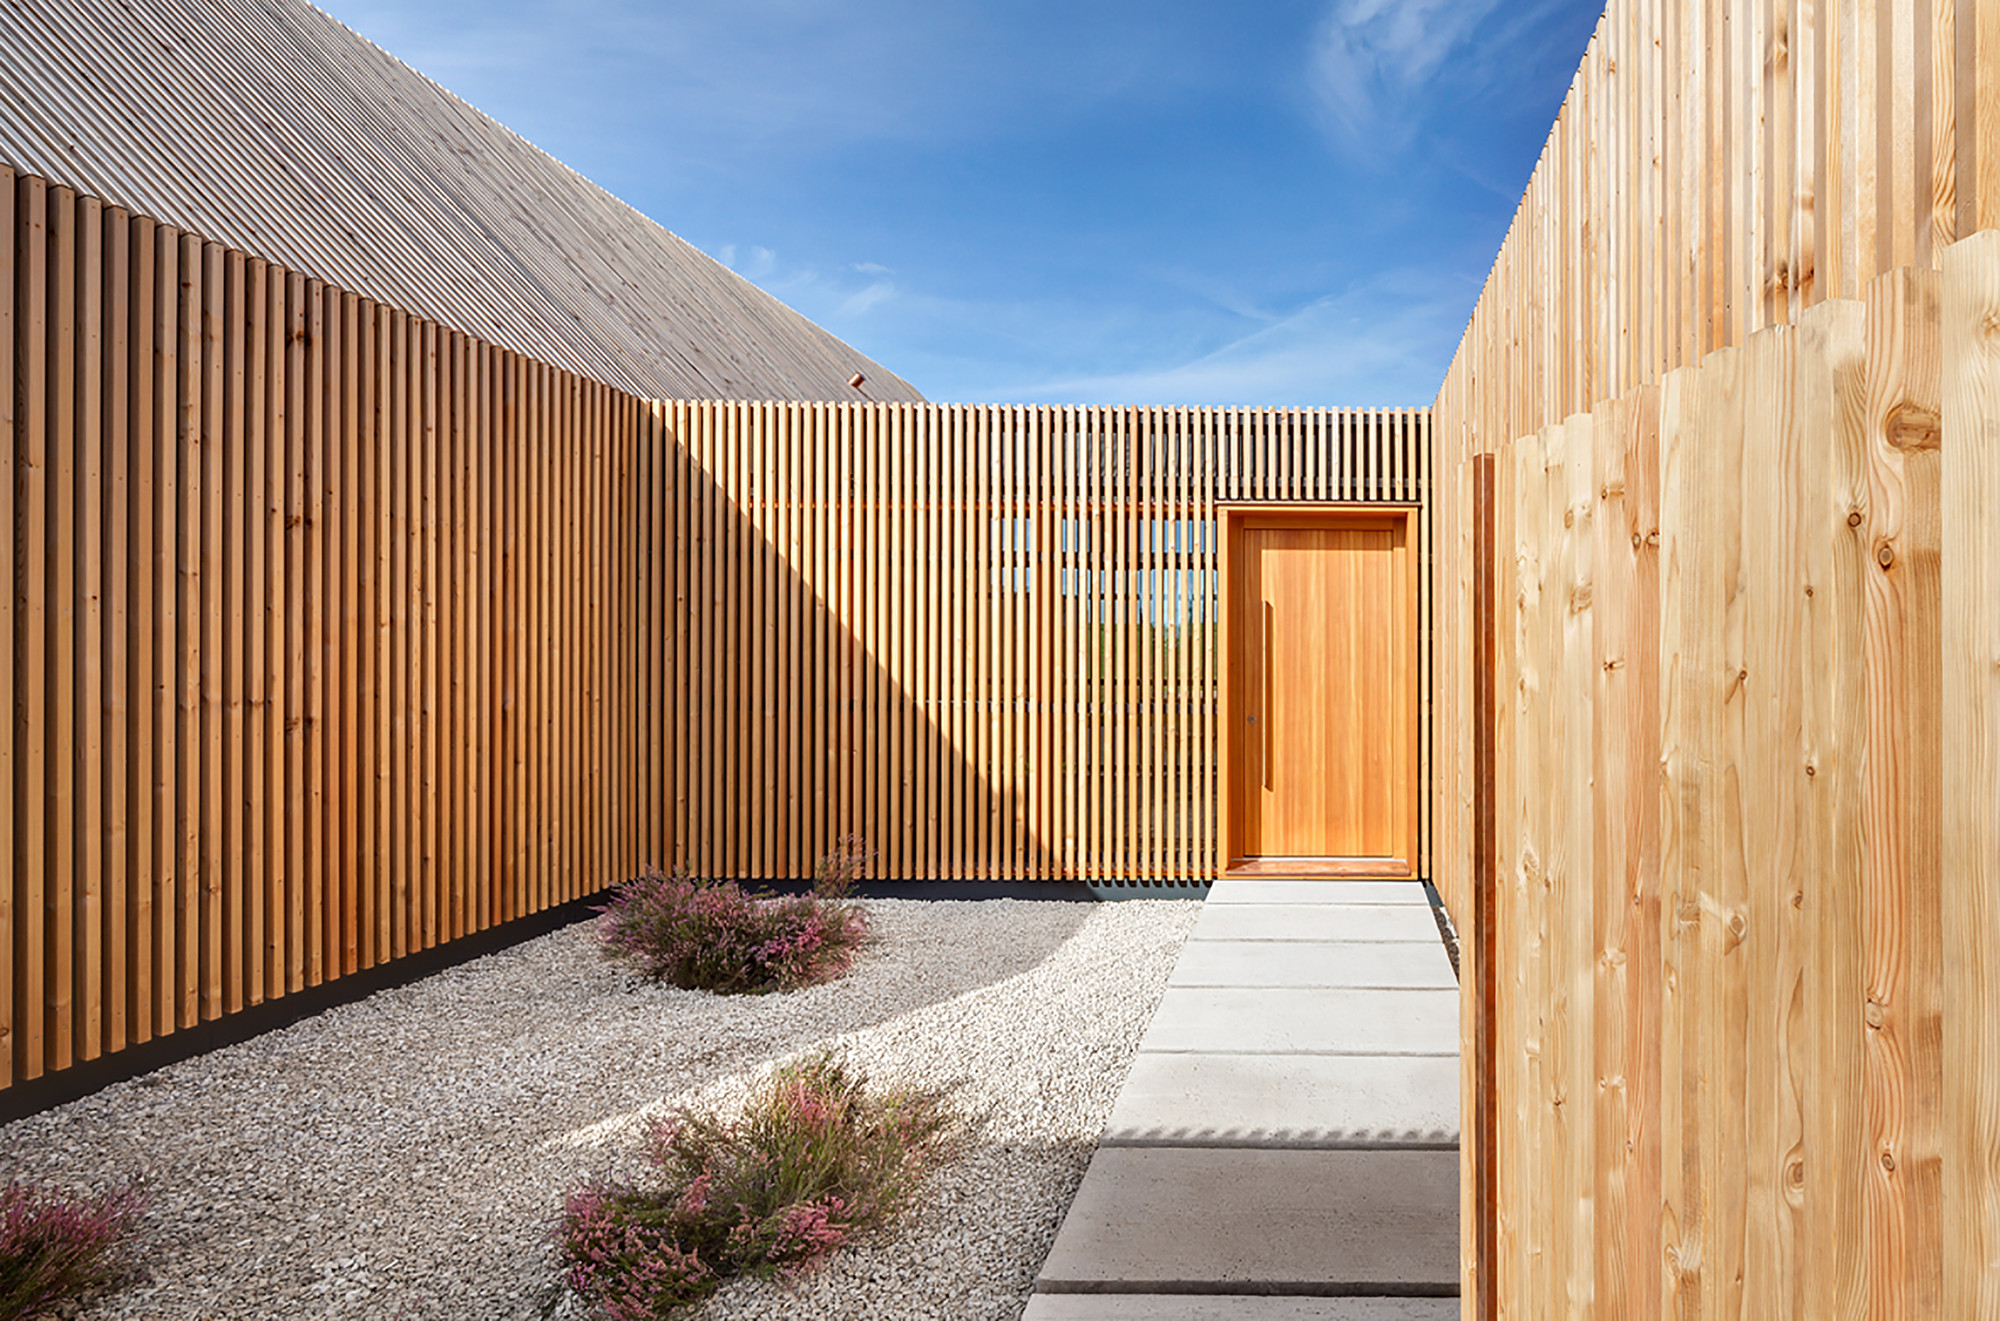 timber house k hnlein architektur archdaily. Black Bedroom Furniture Sets. Home Design Ideas